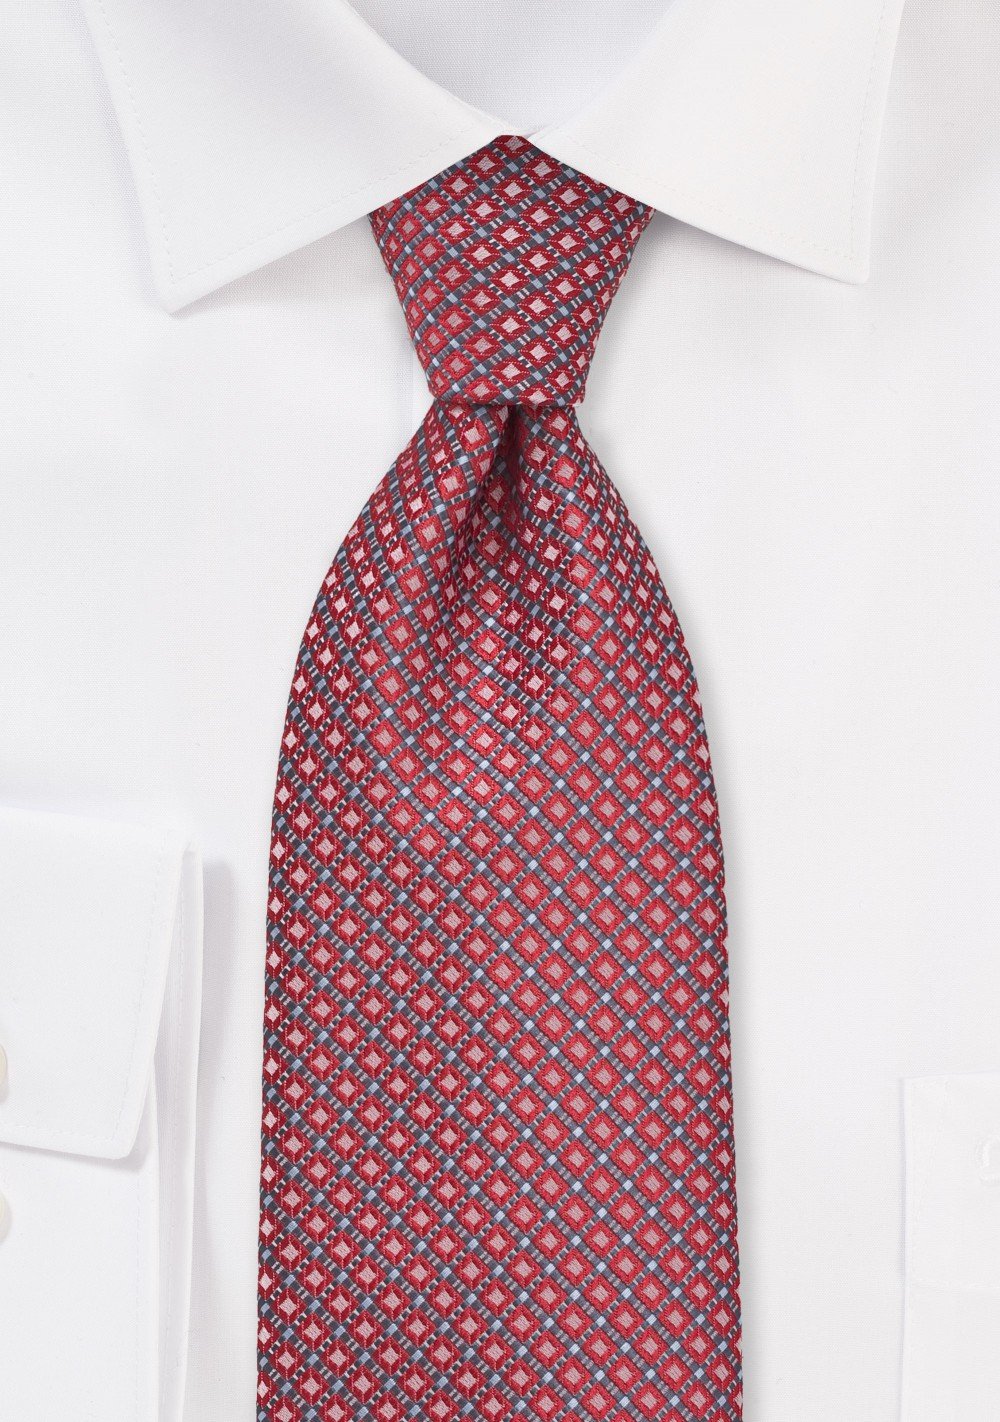 Diamond Pattern XL Length Tie in Red